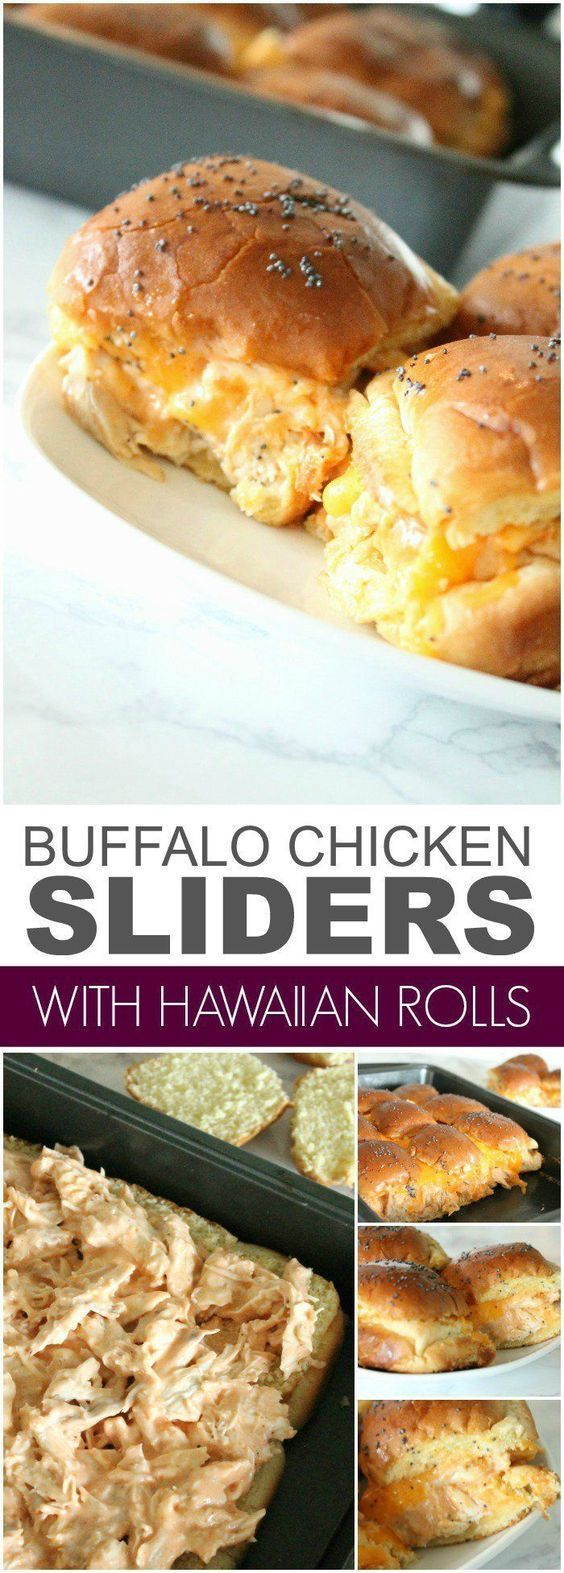 Buffalo Chicken Sliders Recipe with Hawaiian Rolls! - Passion For Savings